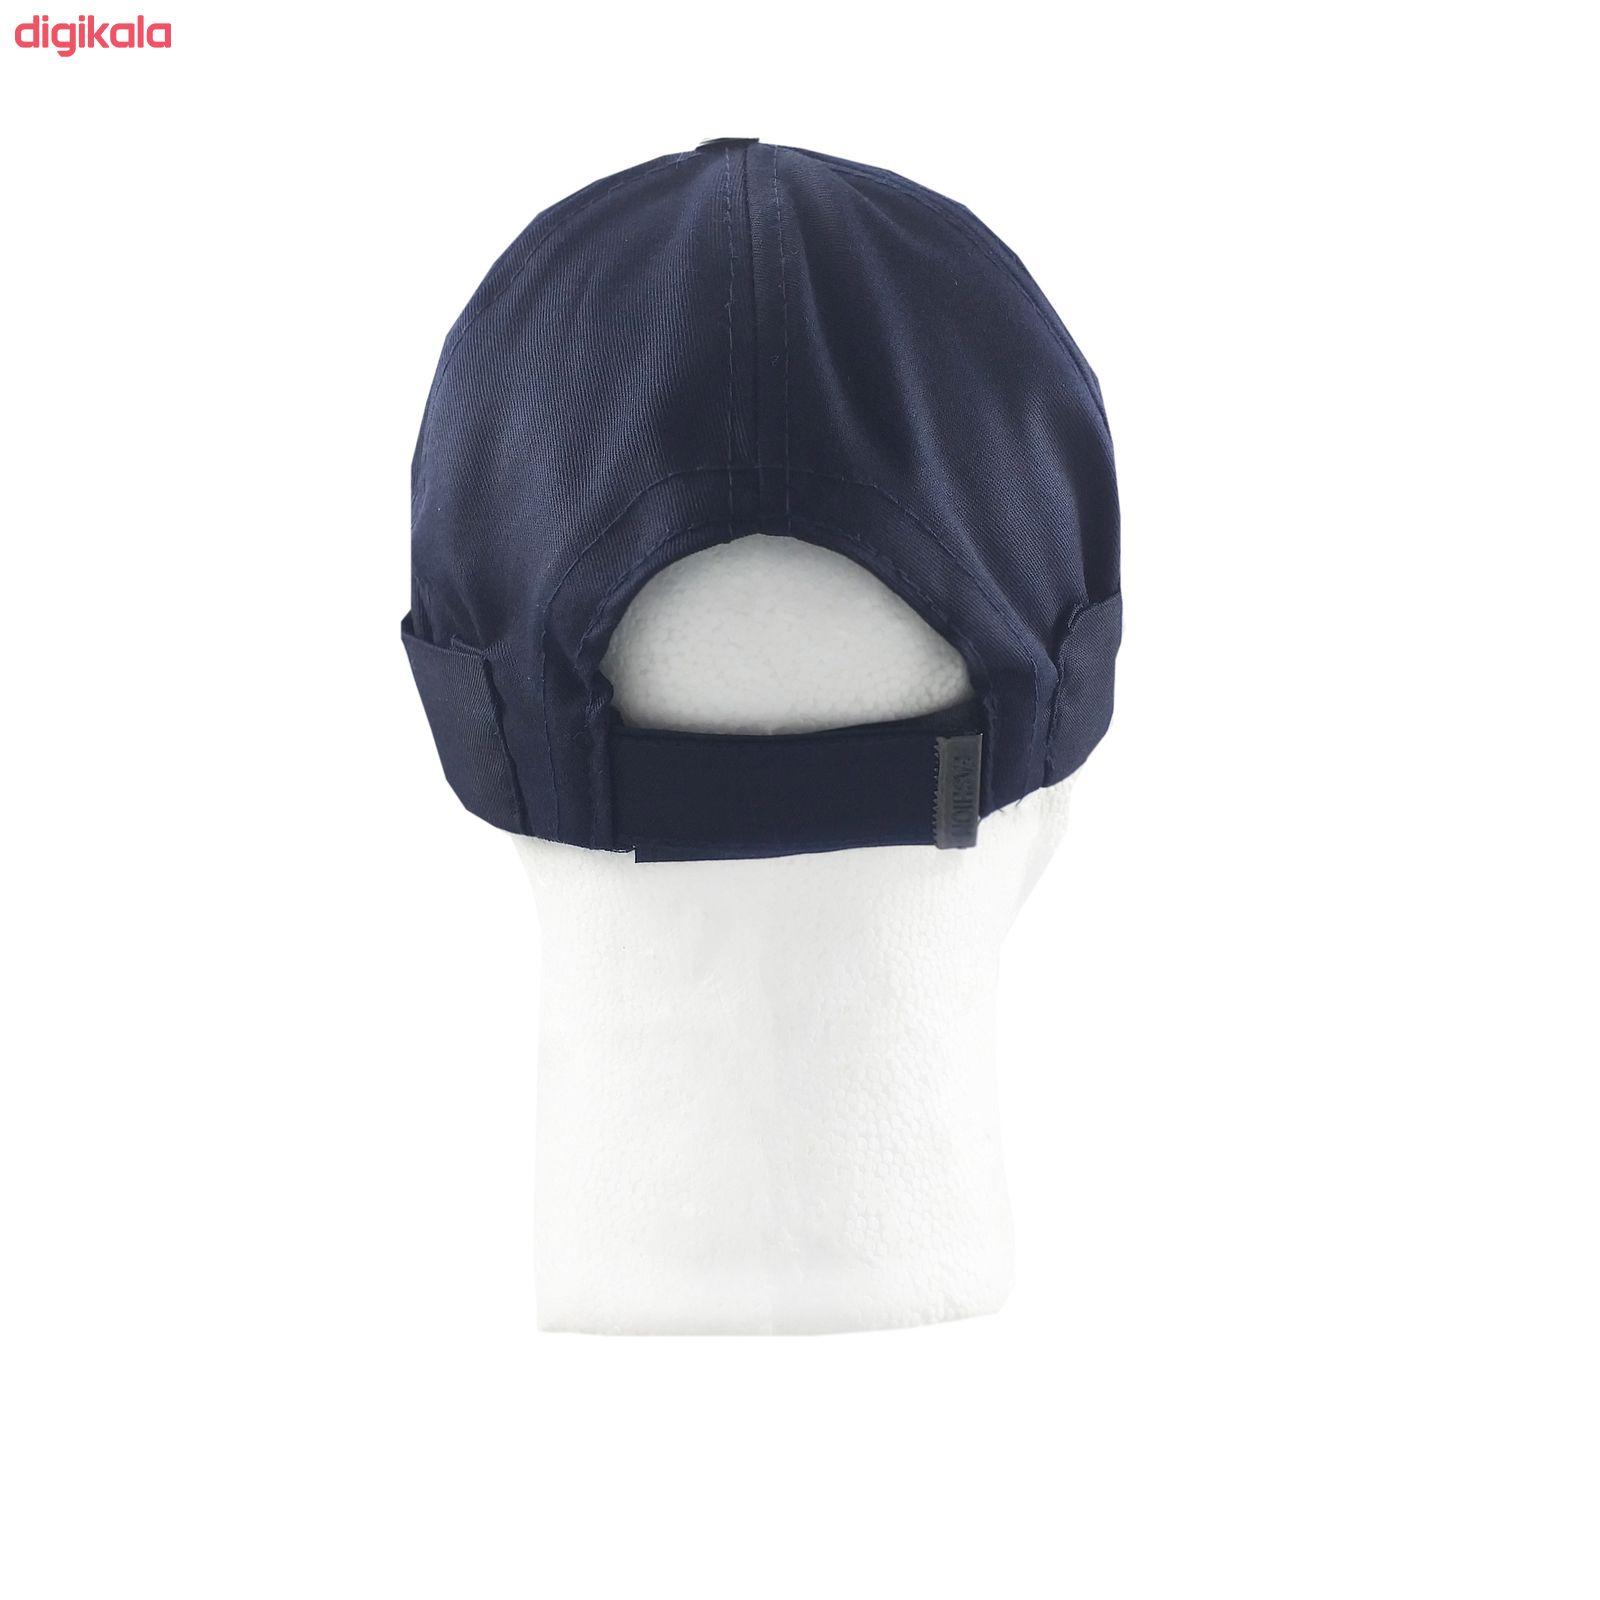 کلاه لئونی مردانه مدل BSOR77 main 1 7